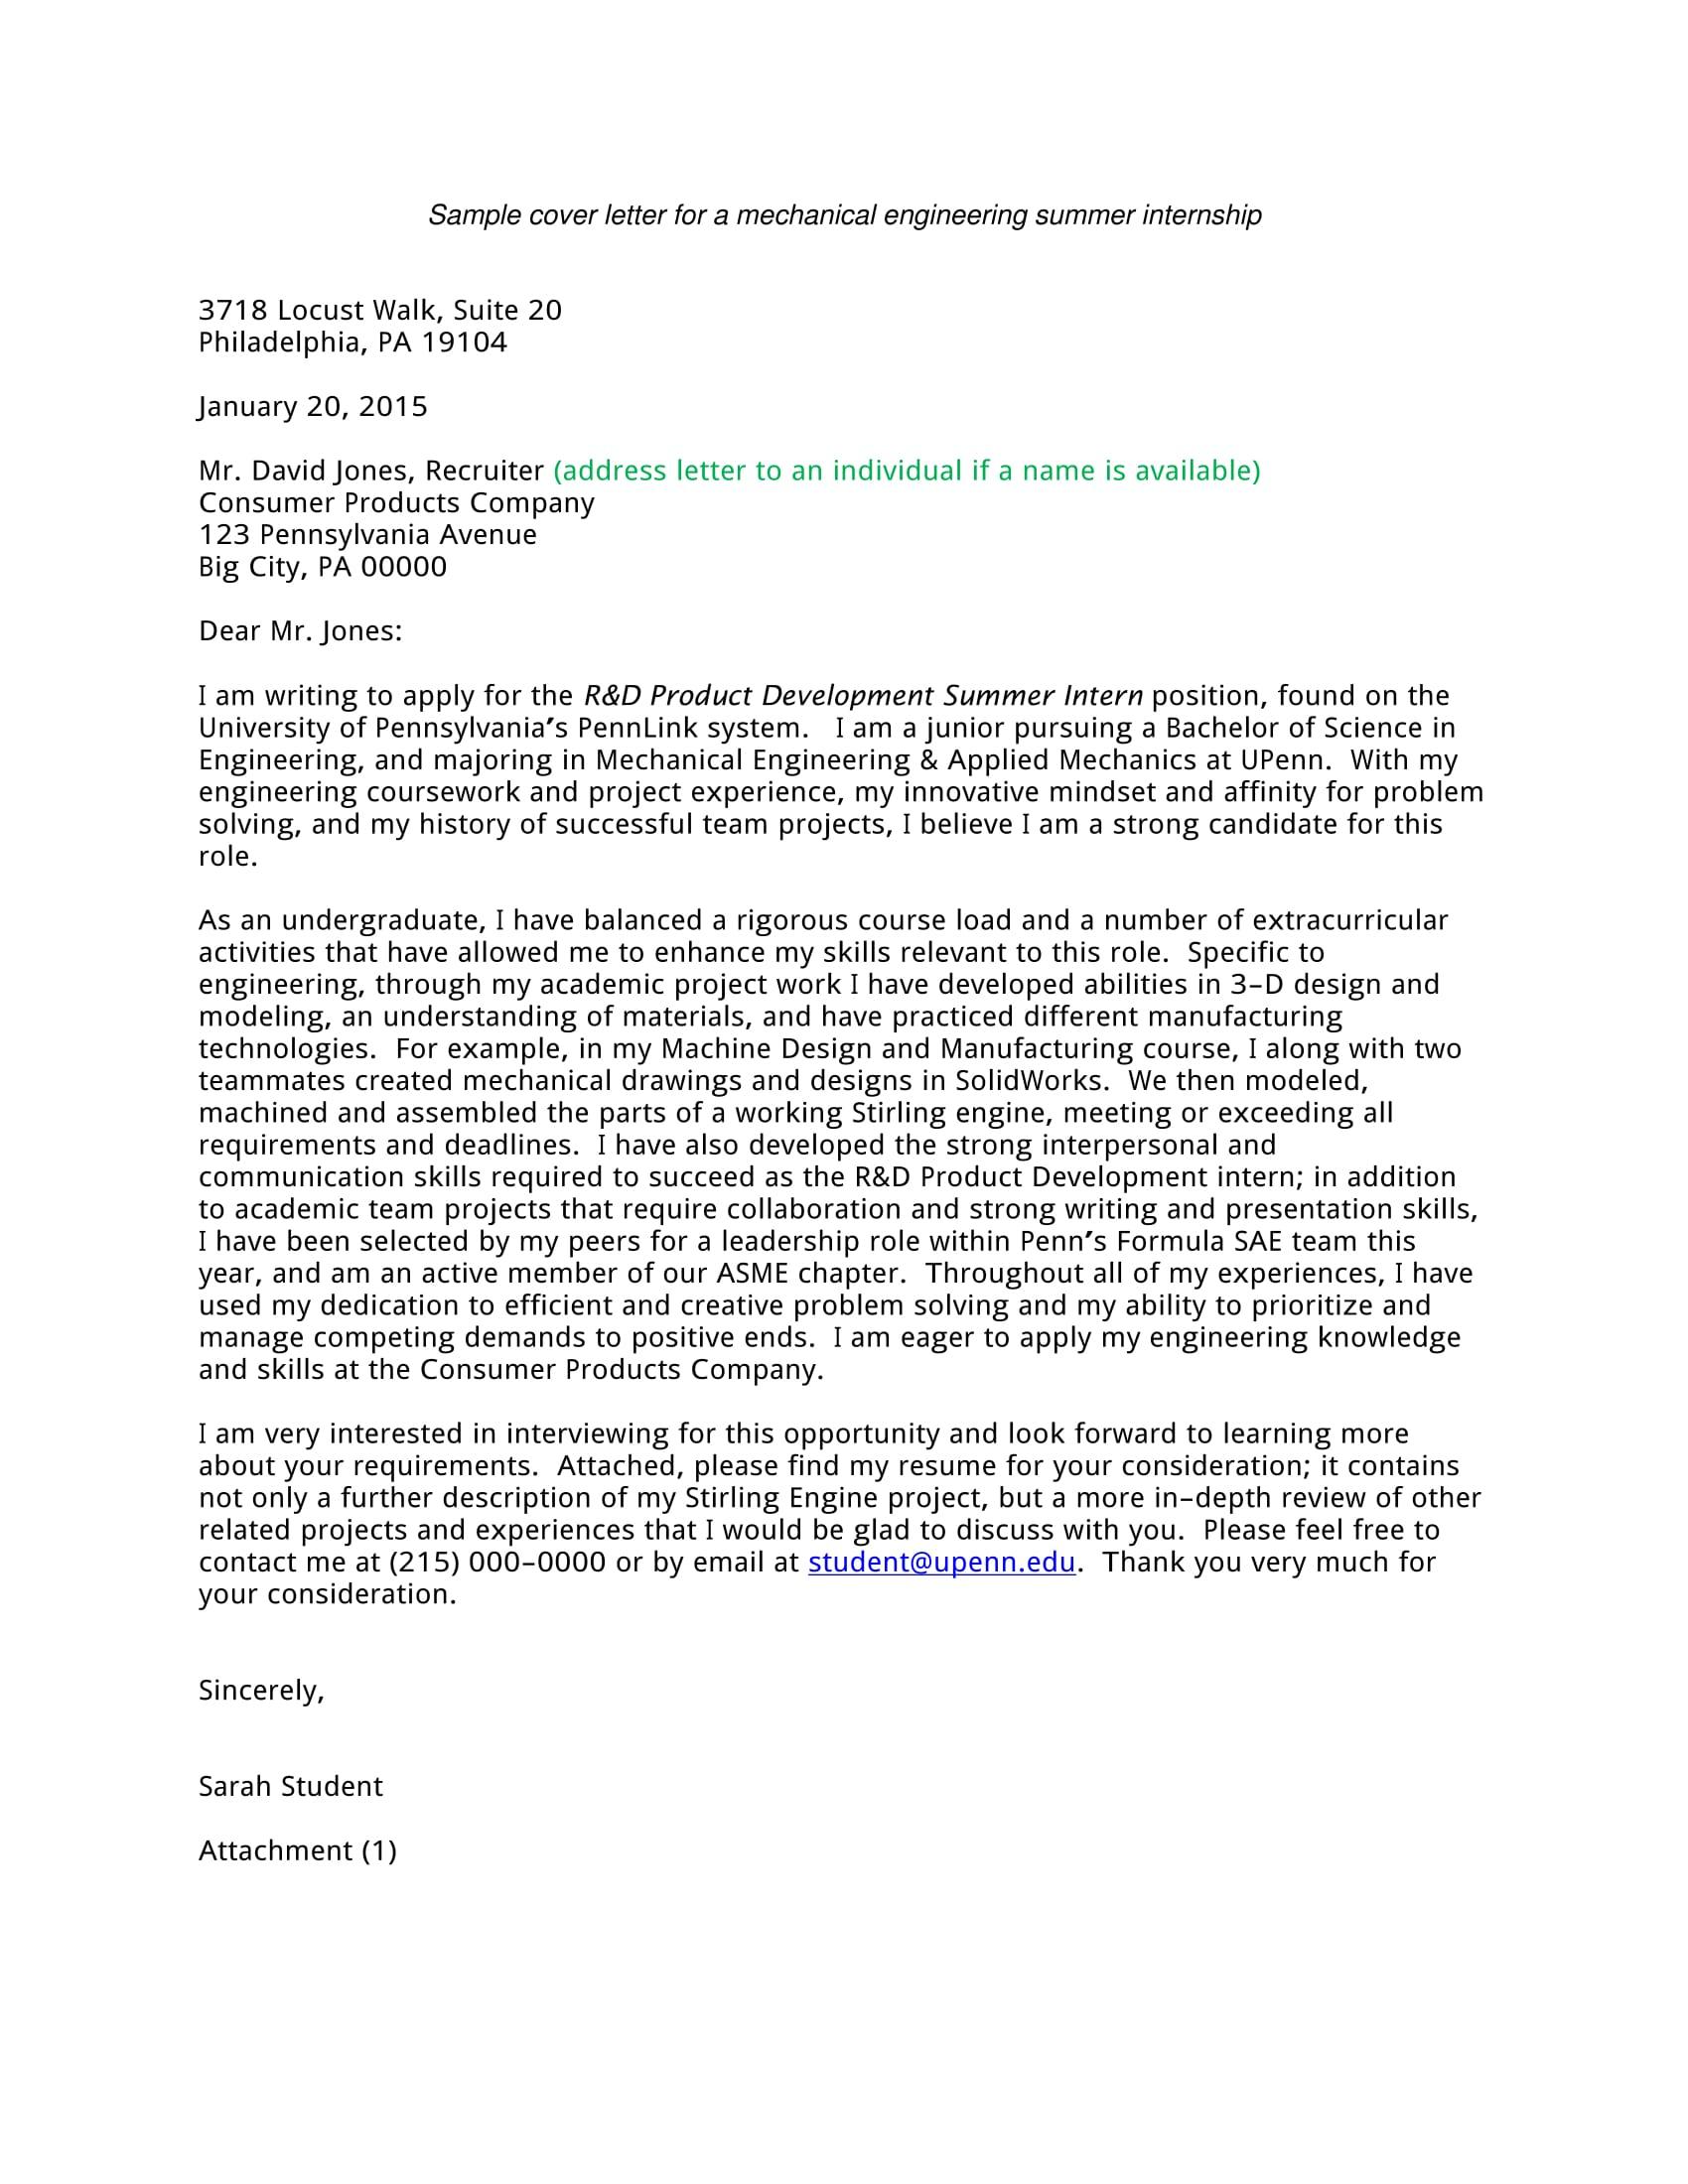 Cover Letter Template For Internship